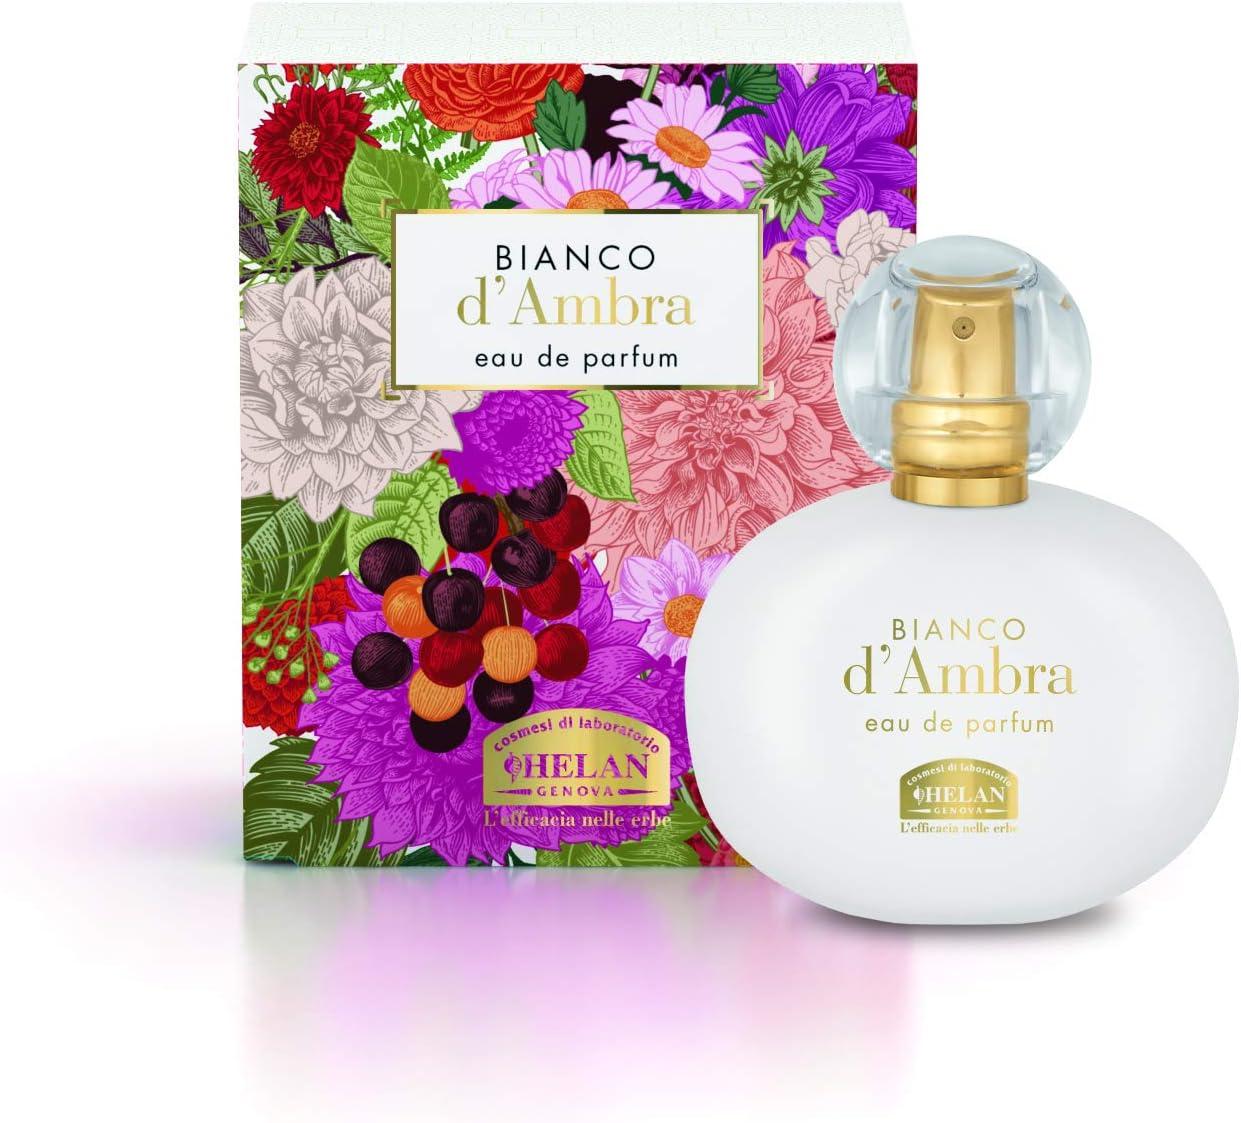 Helan Bianco d'Ambra Eau De Parfum 50 mL: Amazon.it: Bellezza